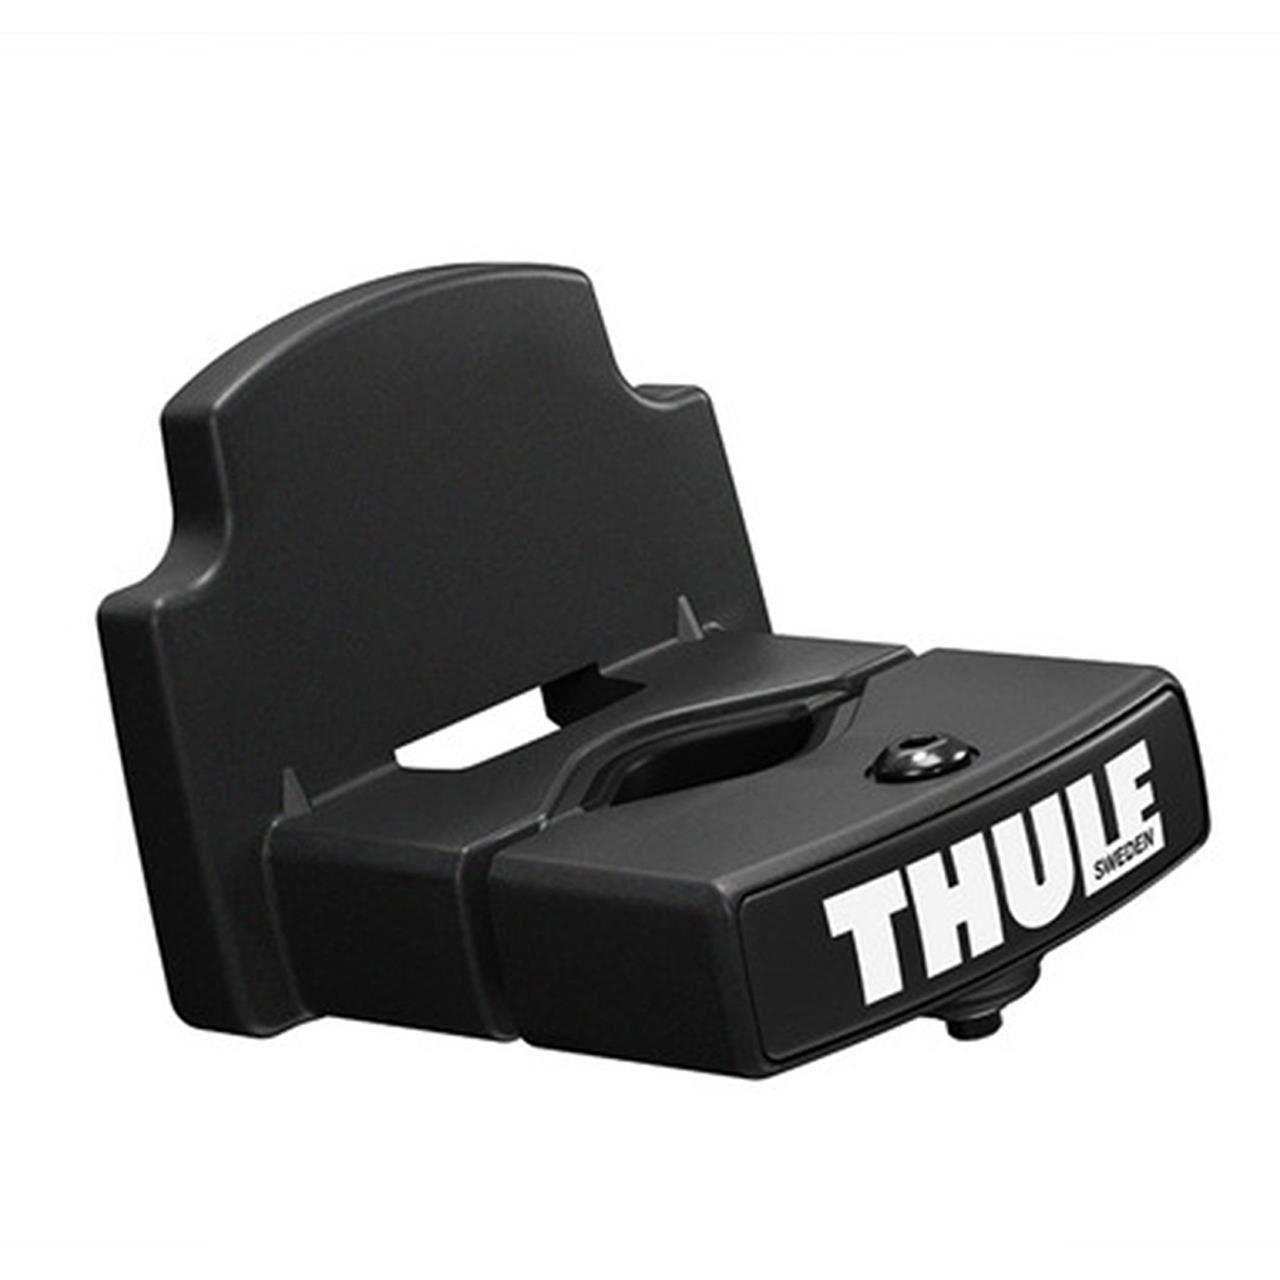 Thule RideAlong Mini Quick Release Bracket imagine